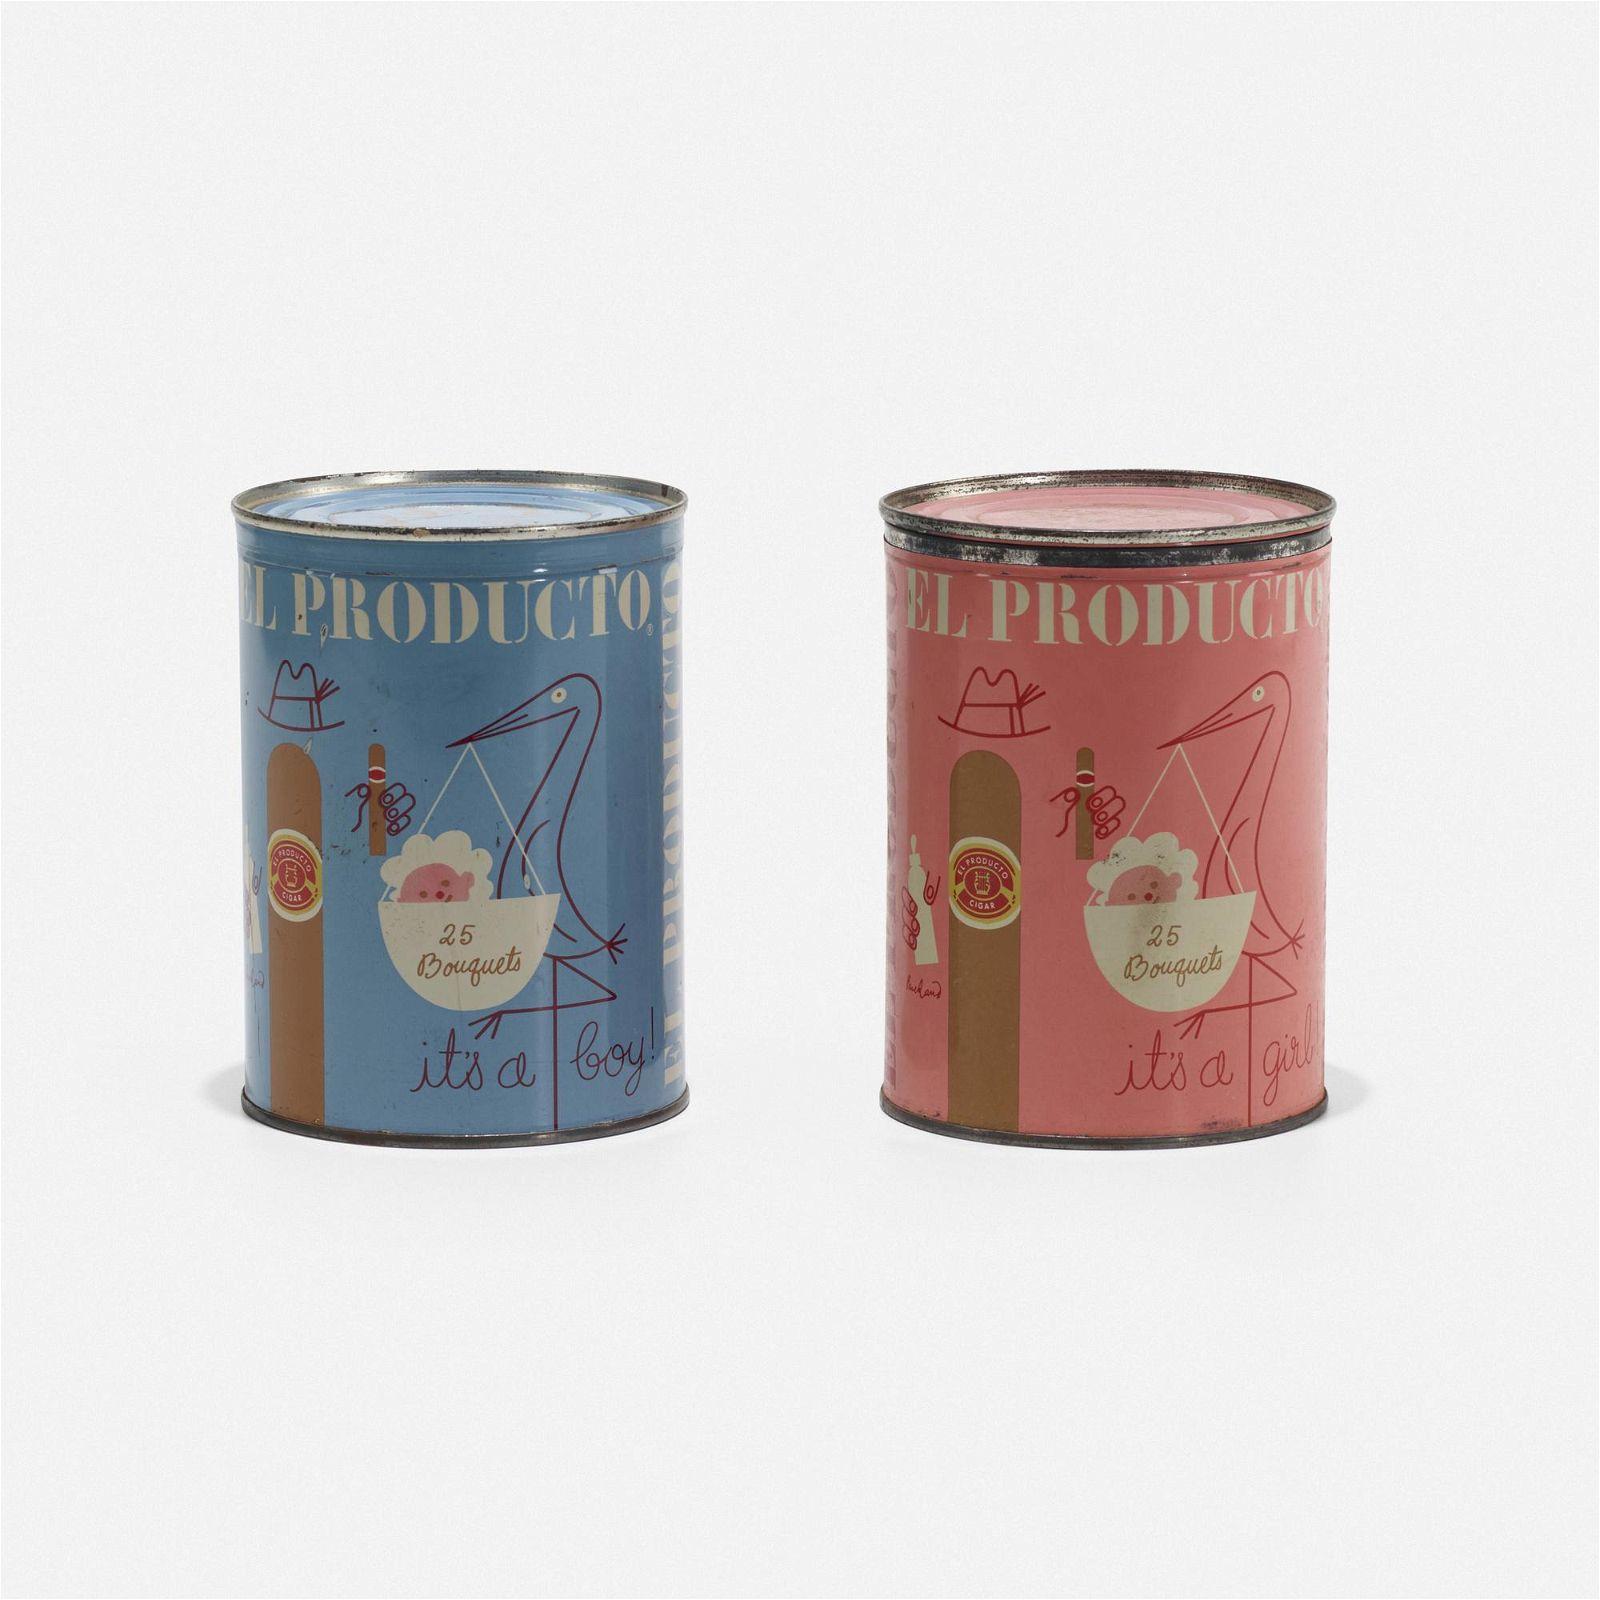 Paul Rand, El Producto cigar tins, pair